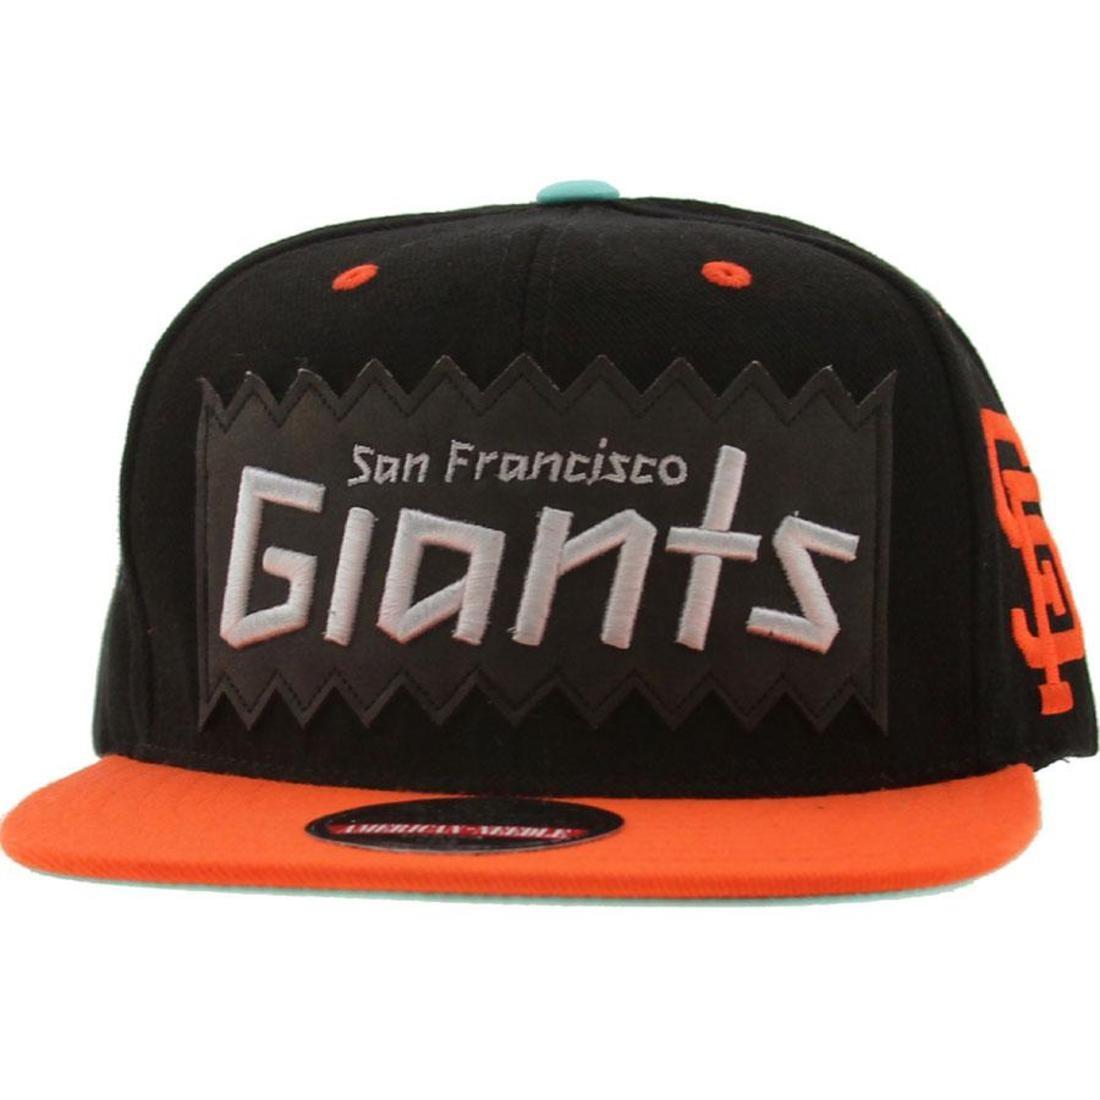 50905677550 BAIT x MLB x American Needle San Francisco Giants Retro Snapback Cap (black    orange)